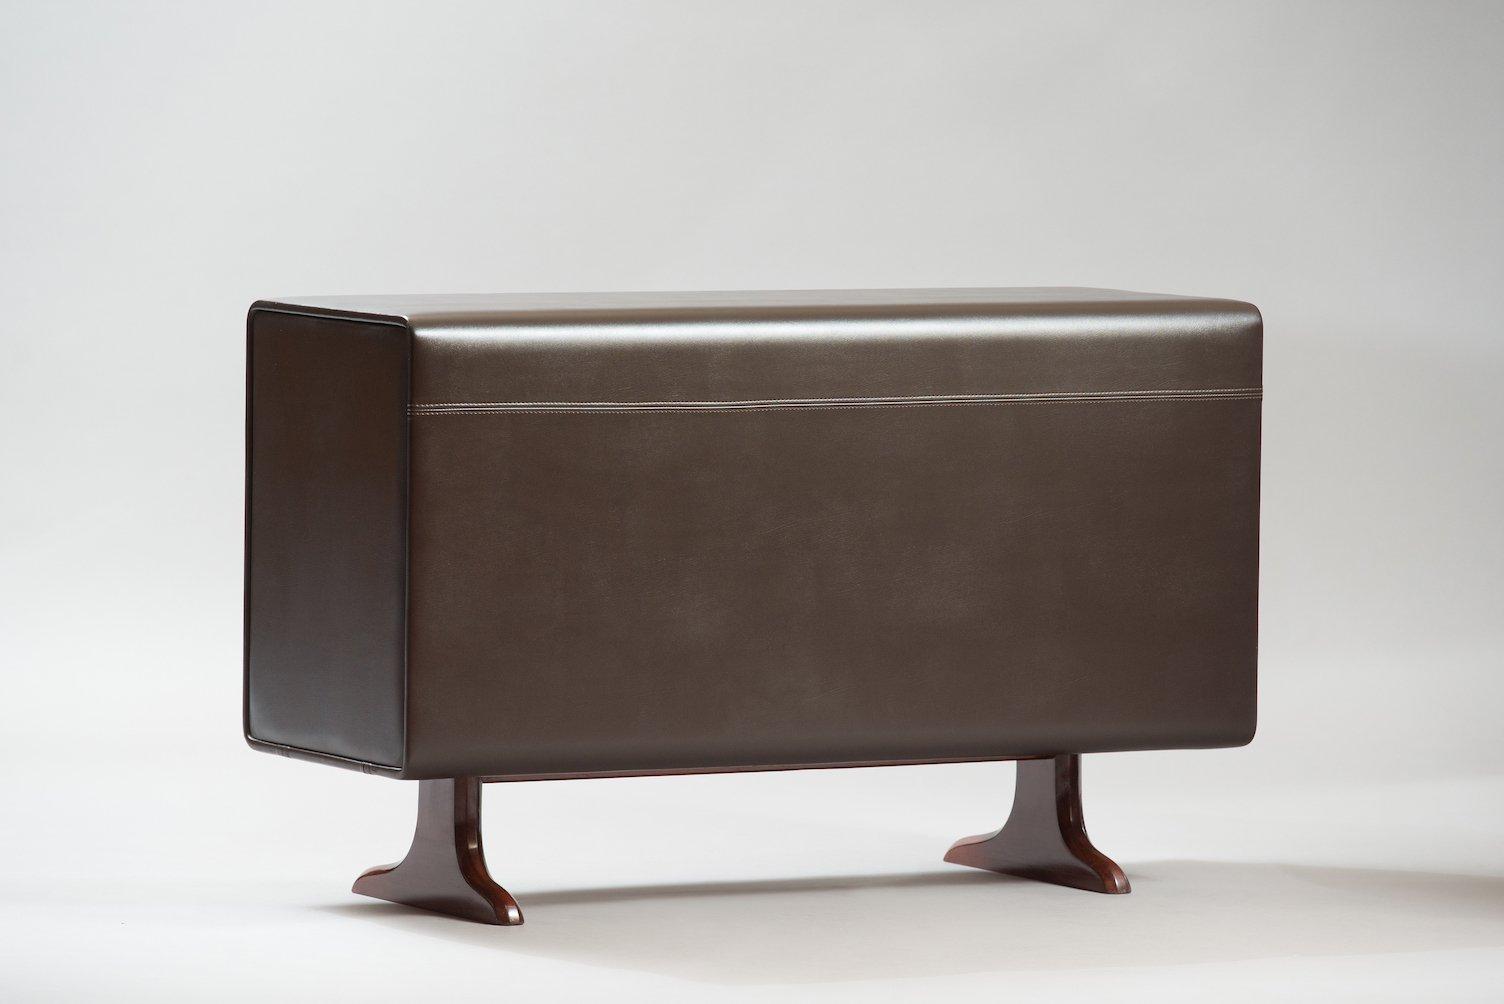 d nisches vintage b ro sideboard bei pamono kaufen. Black Bedroom Furniture Sets. Home Design Ideas